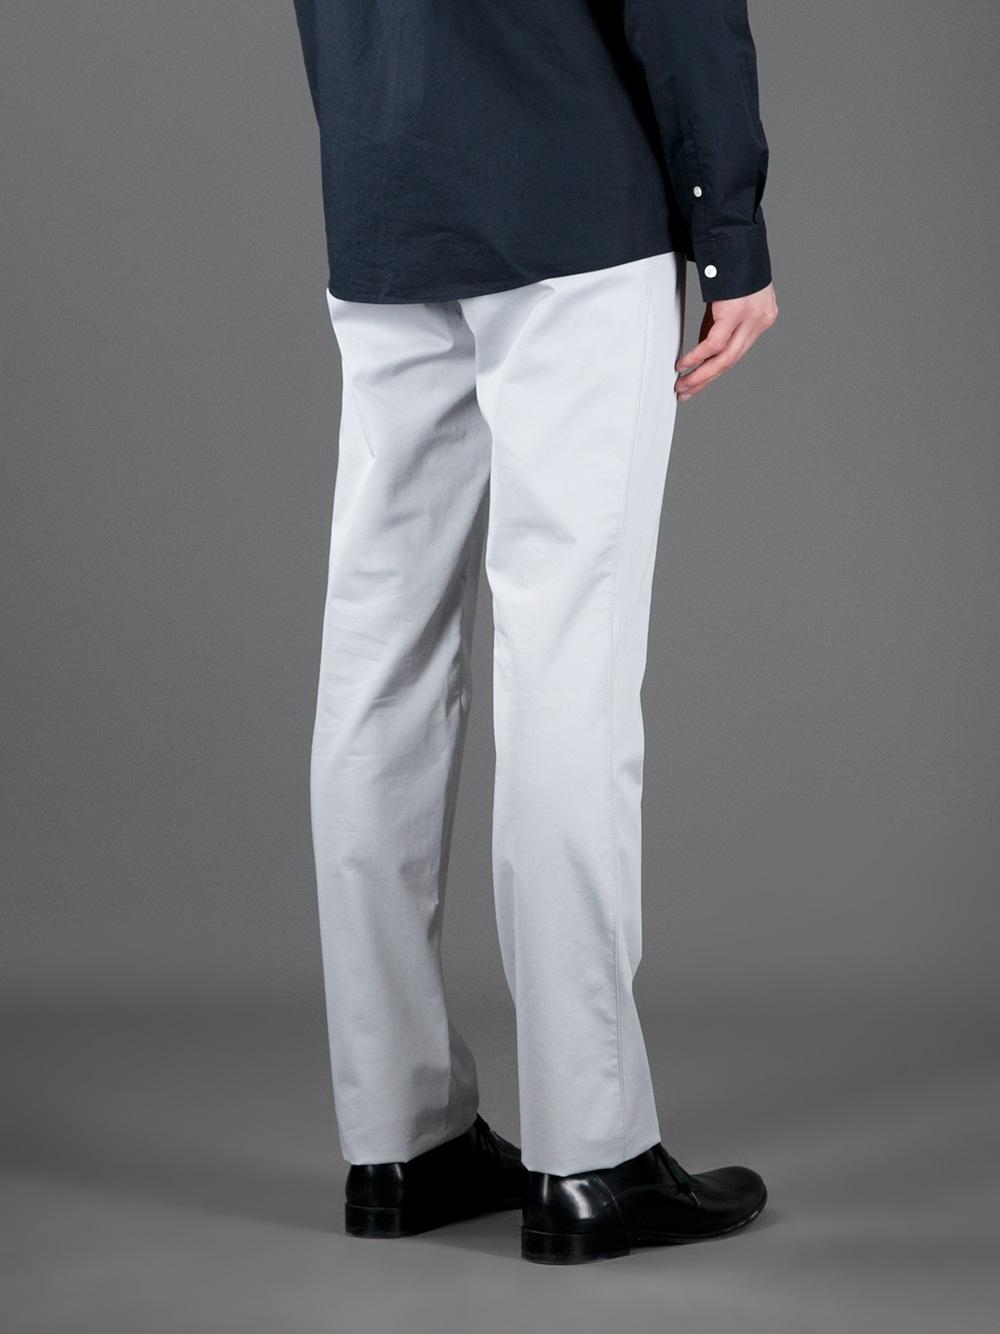 Balenciaga Chino Trouser in Grey (Grey) for Men